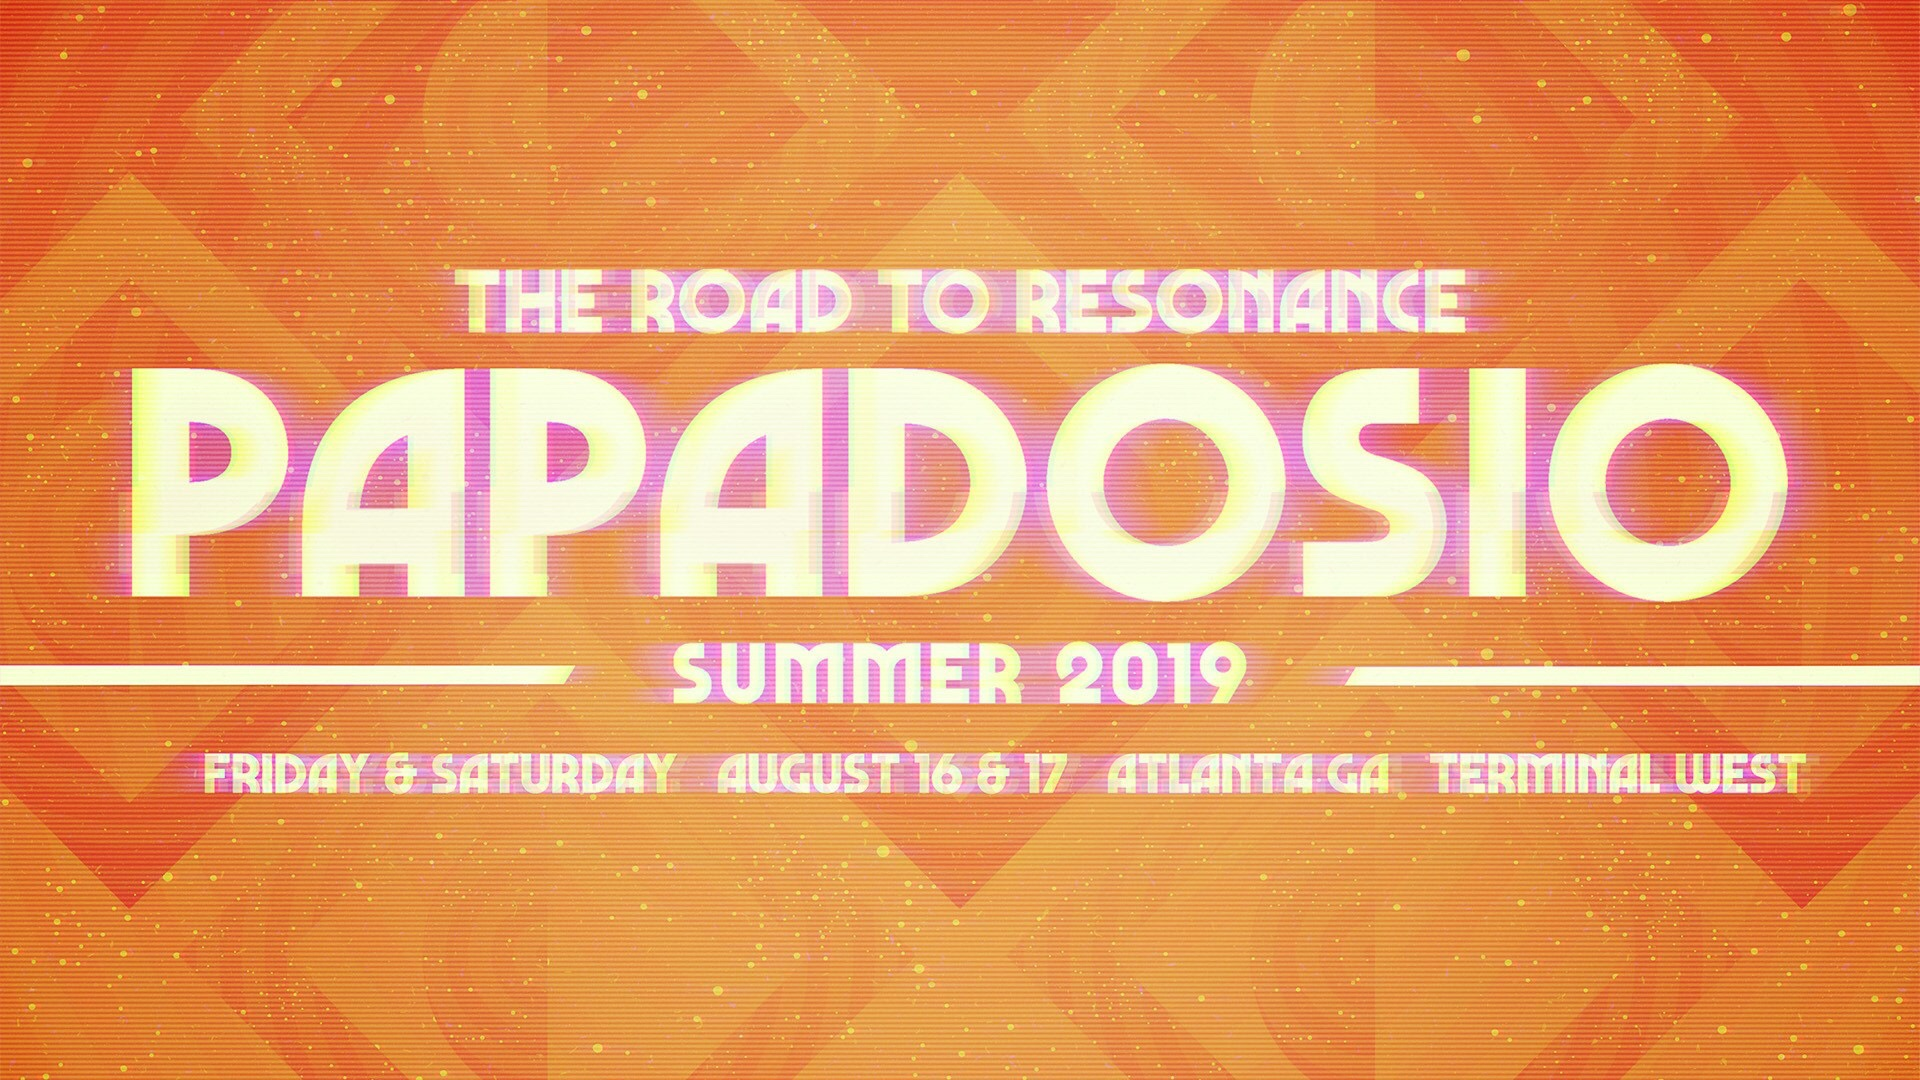 Papadosio: The Road to Resonance